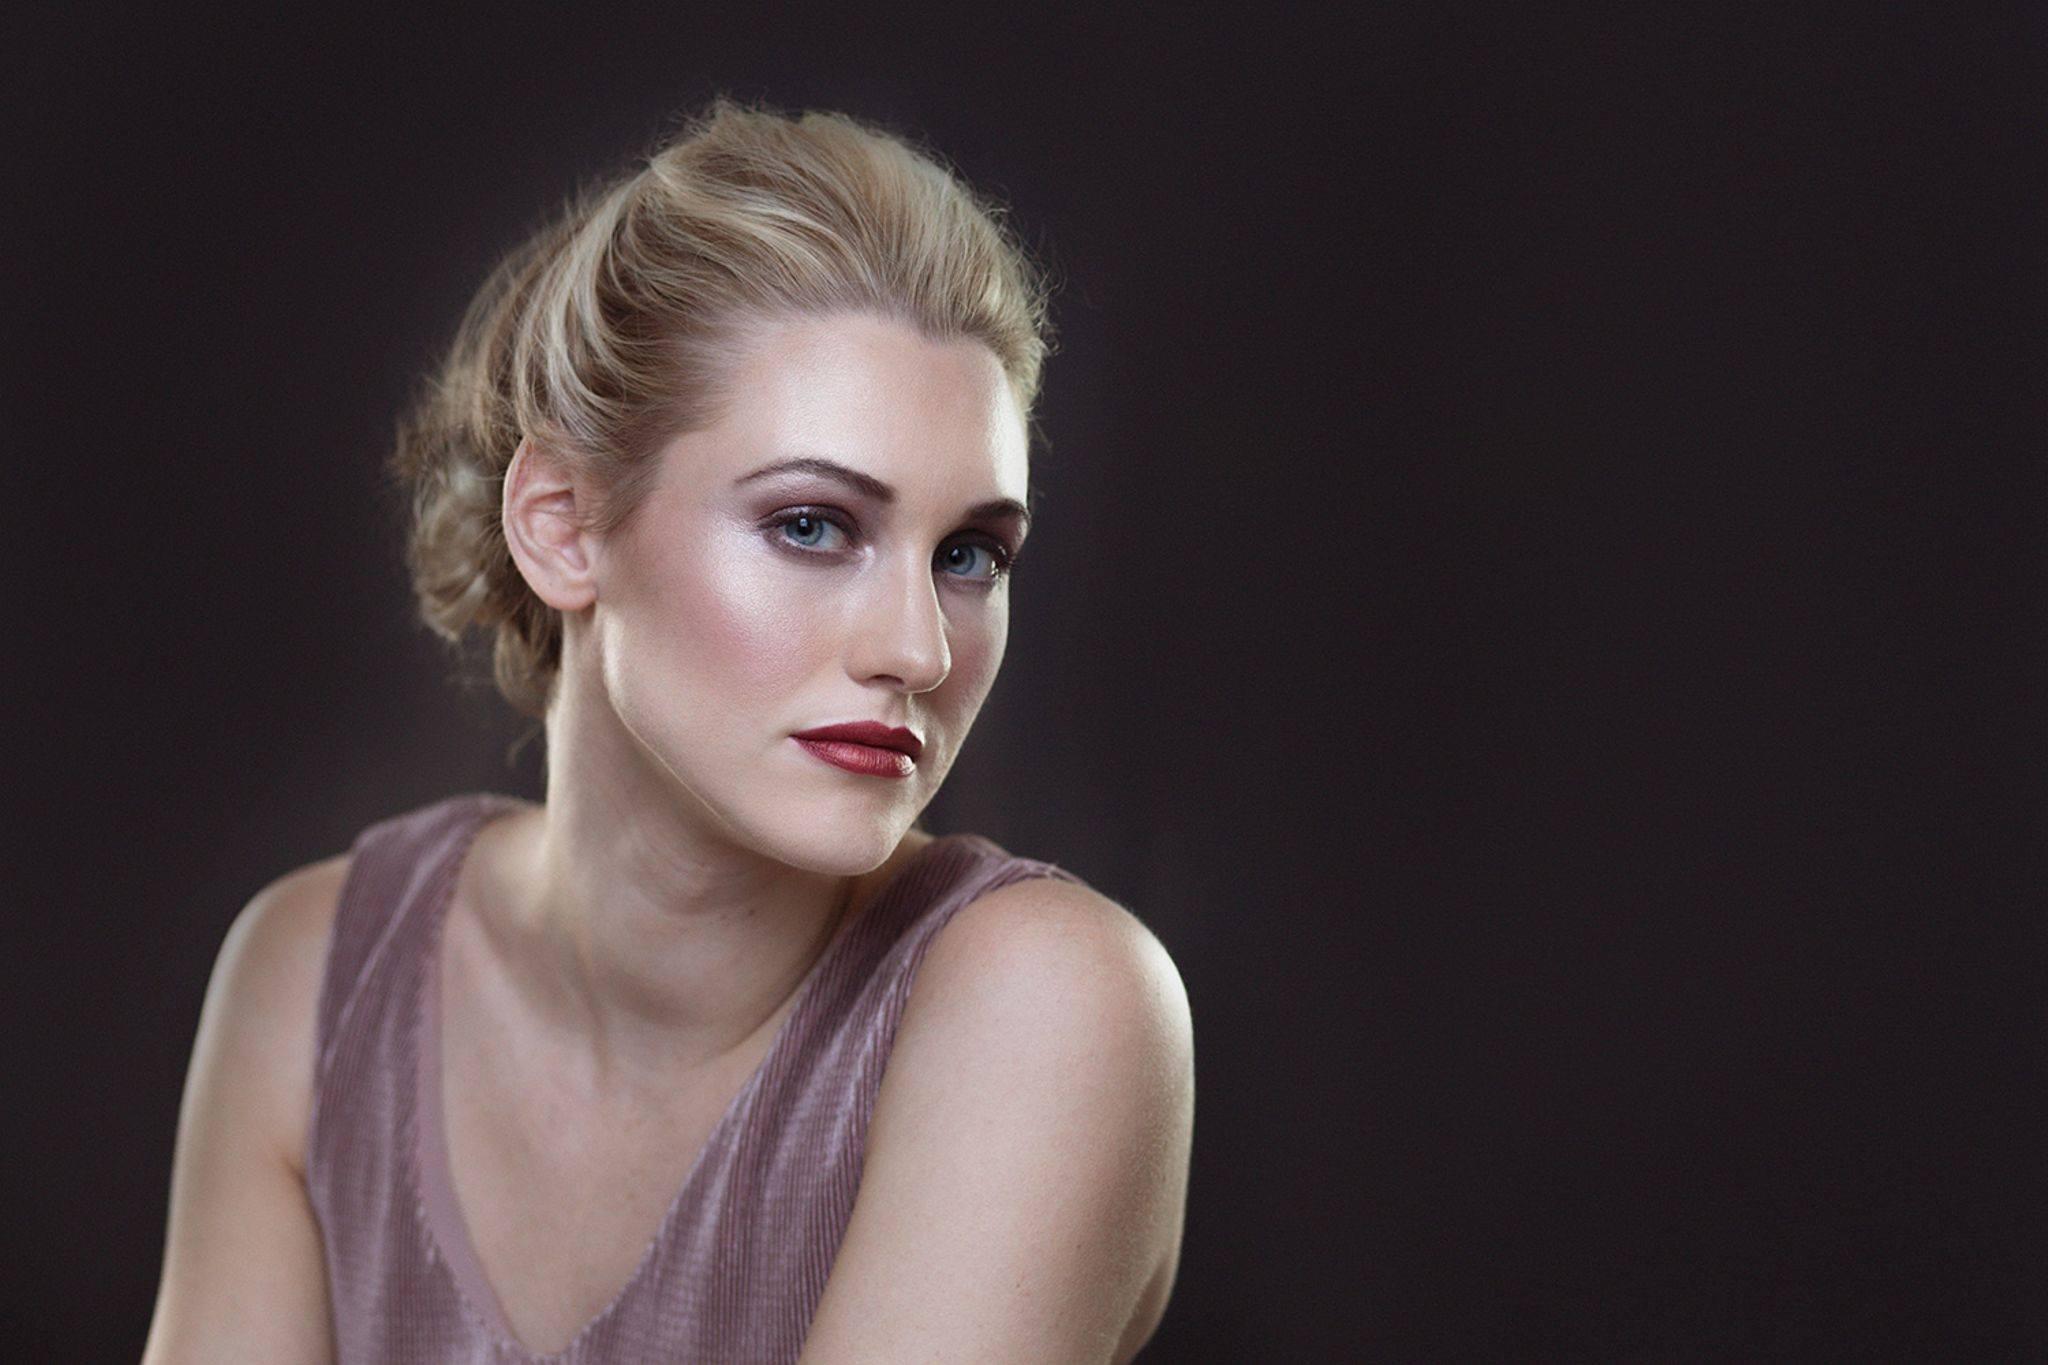 woman-portrait-photography-beauty-sissela